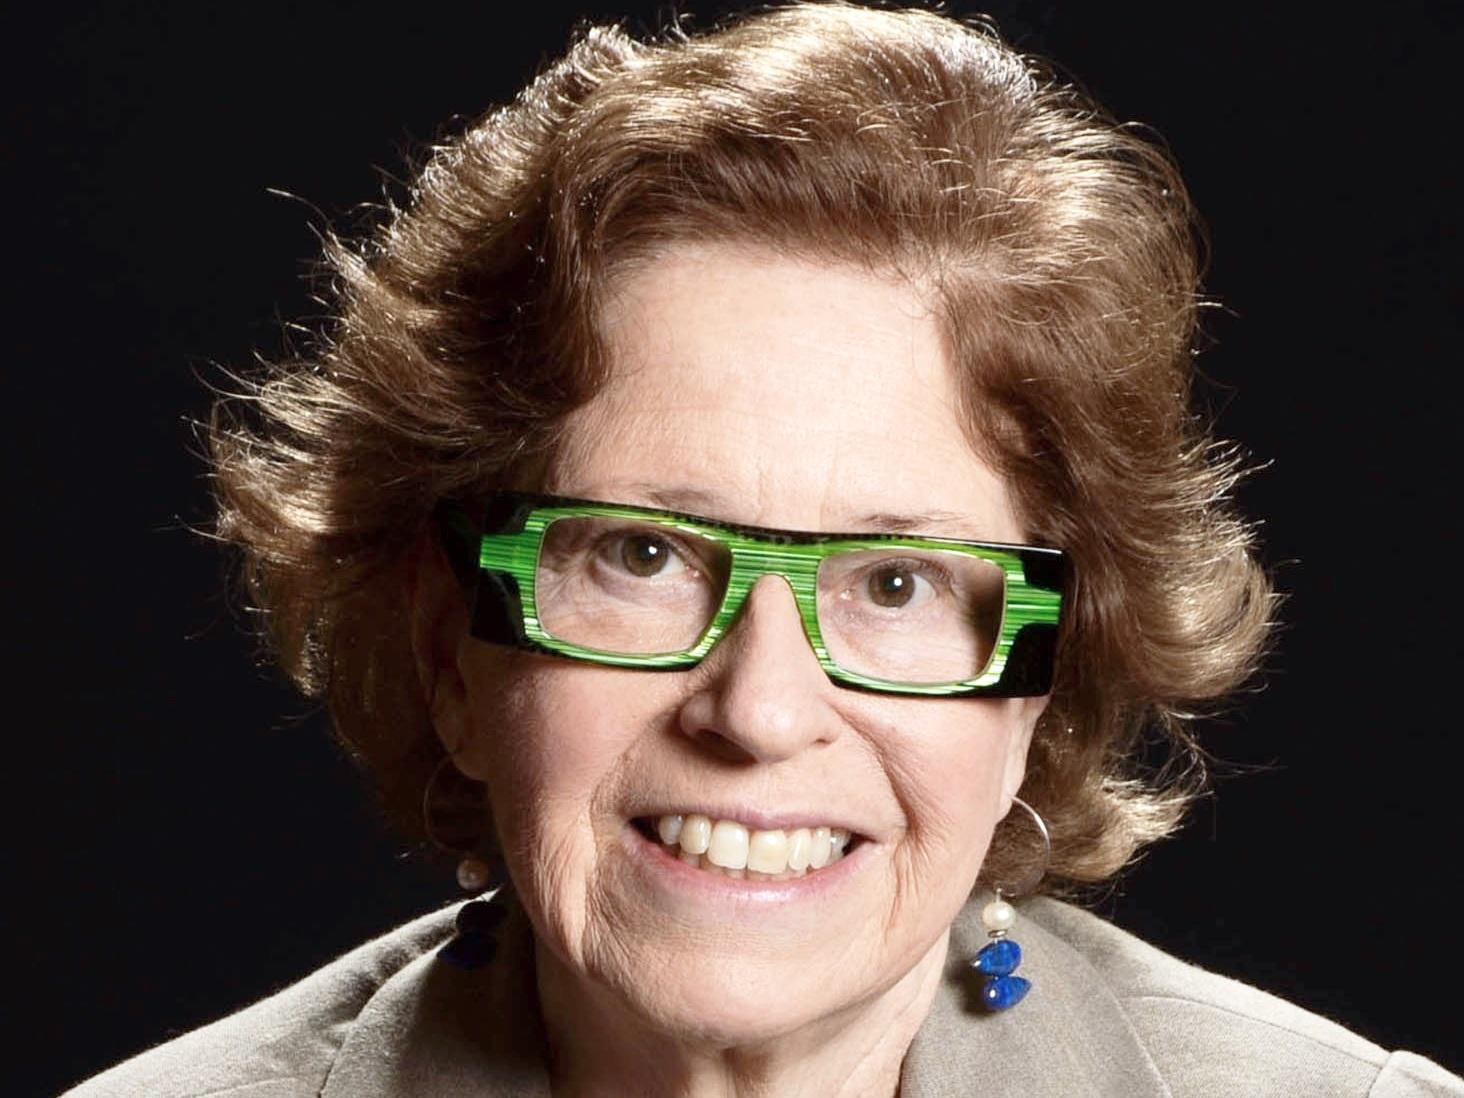 Professor of Political Science, Swarthmore College   Swarthmore